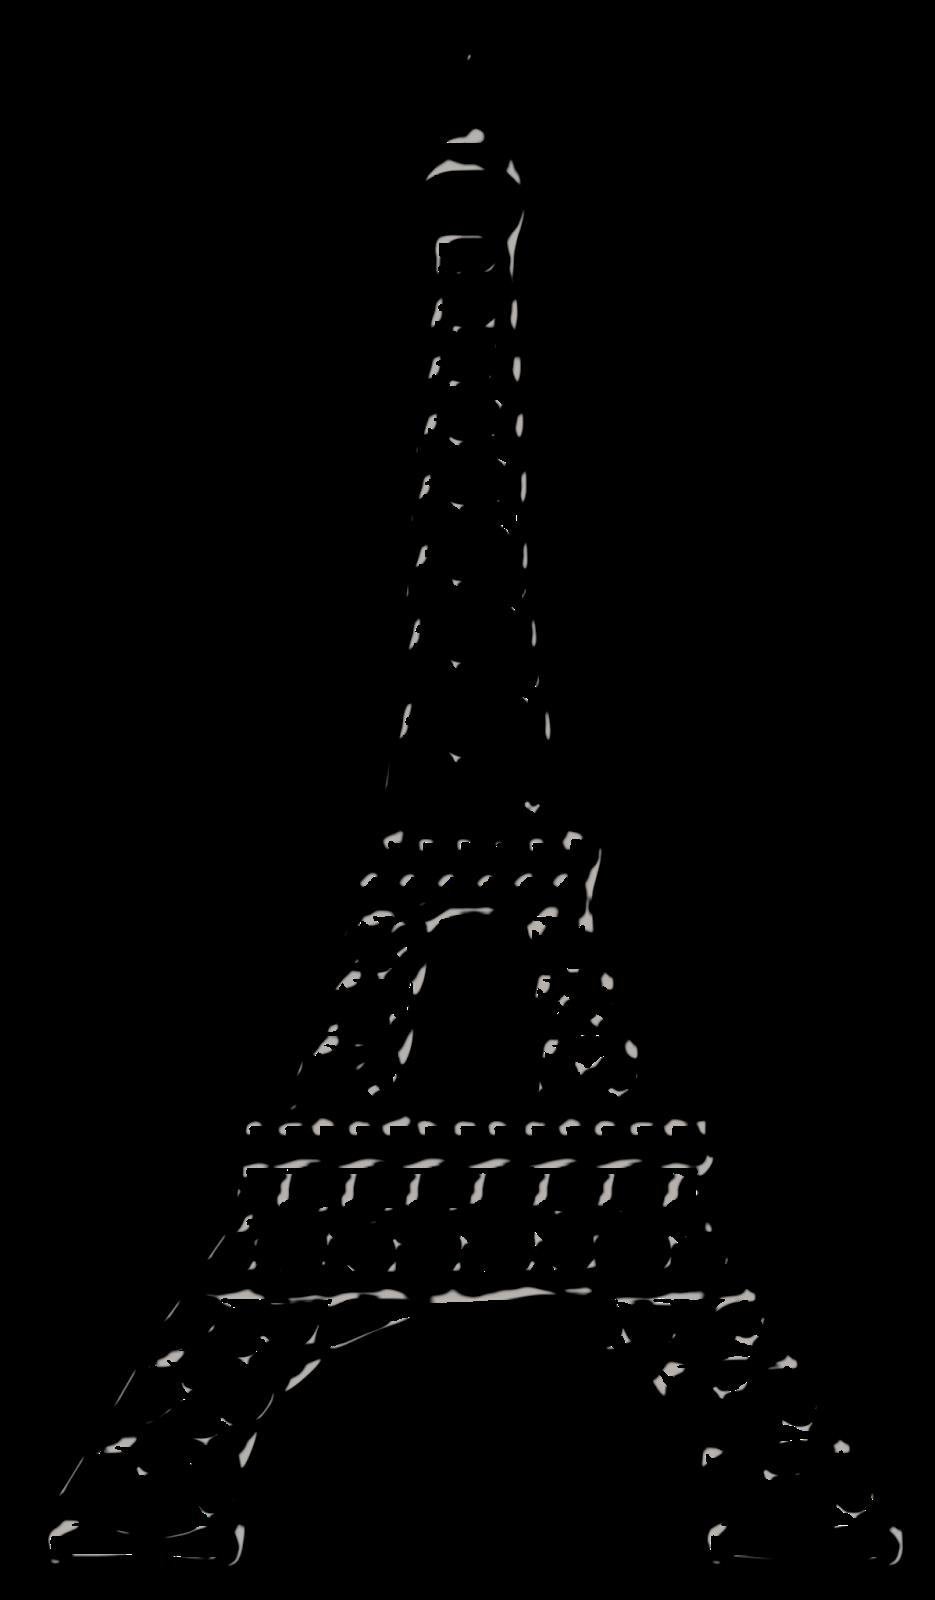 Bello Clipart Chic Paris Torre Eiffel Dibujo Pintura De Torre Eiffel Imagenes De Torres